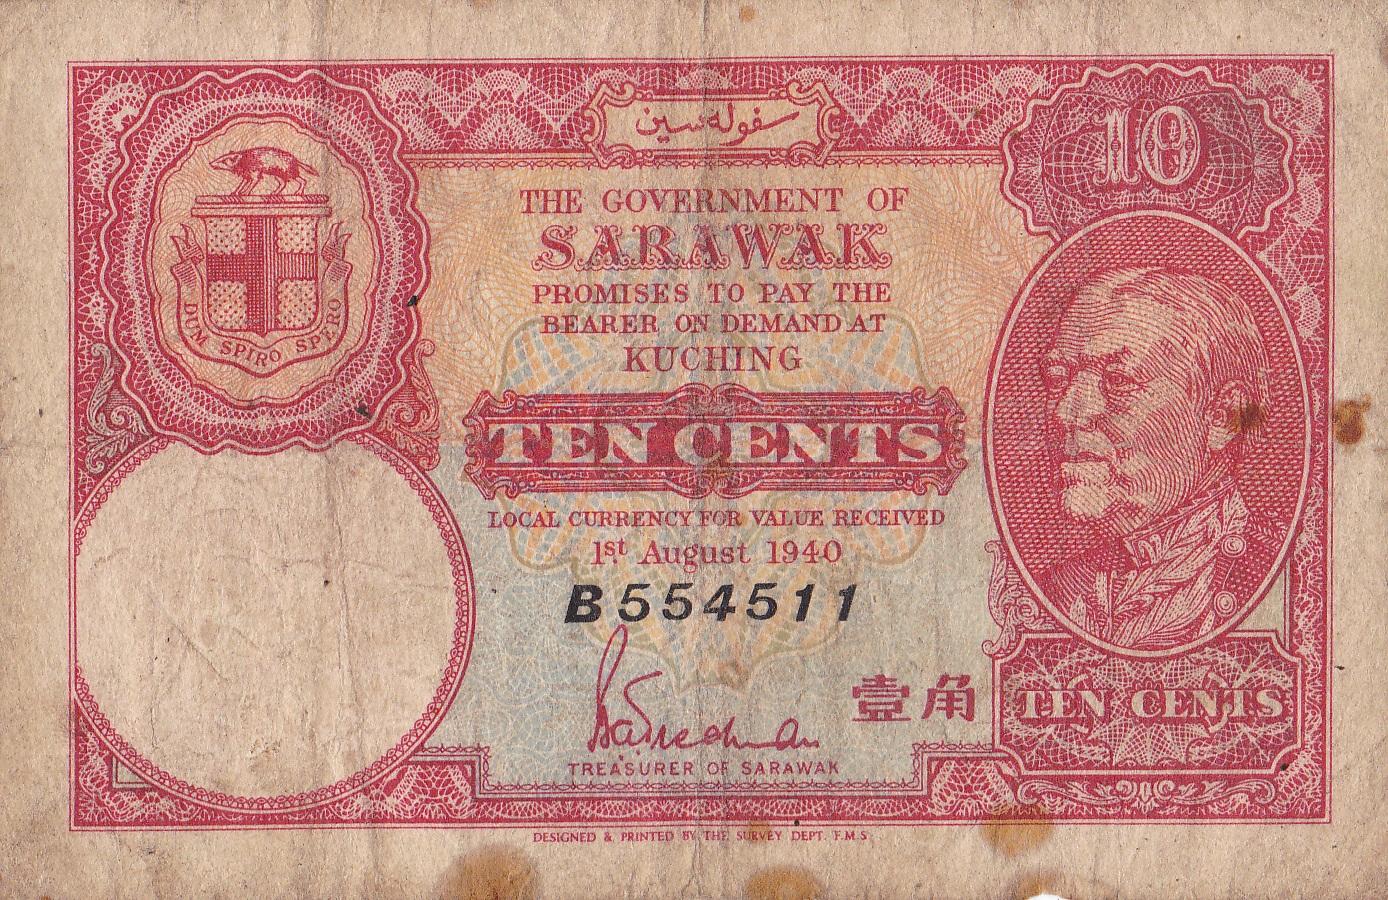 1940 Sarawak Banknote - 10 Dollars